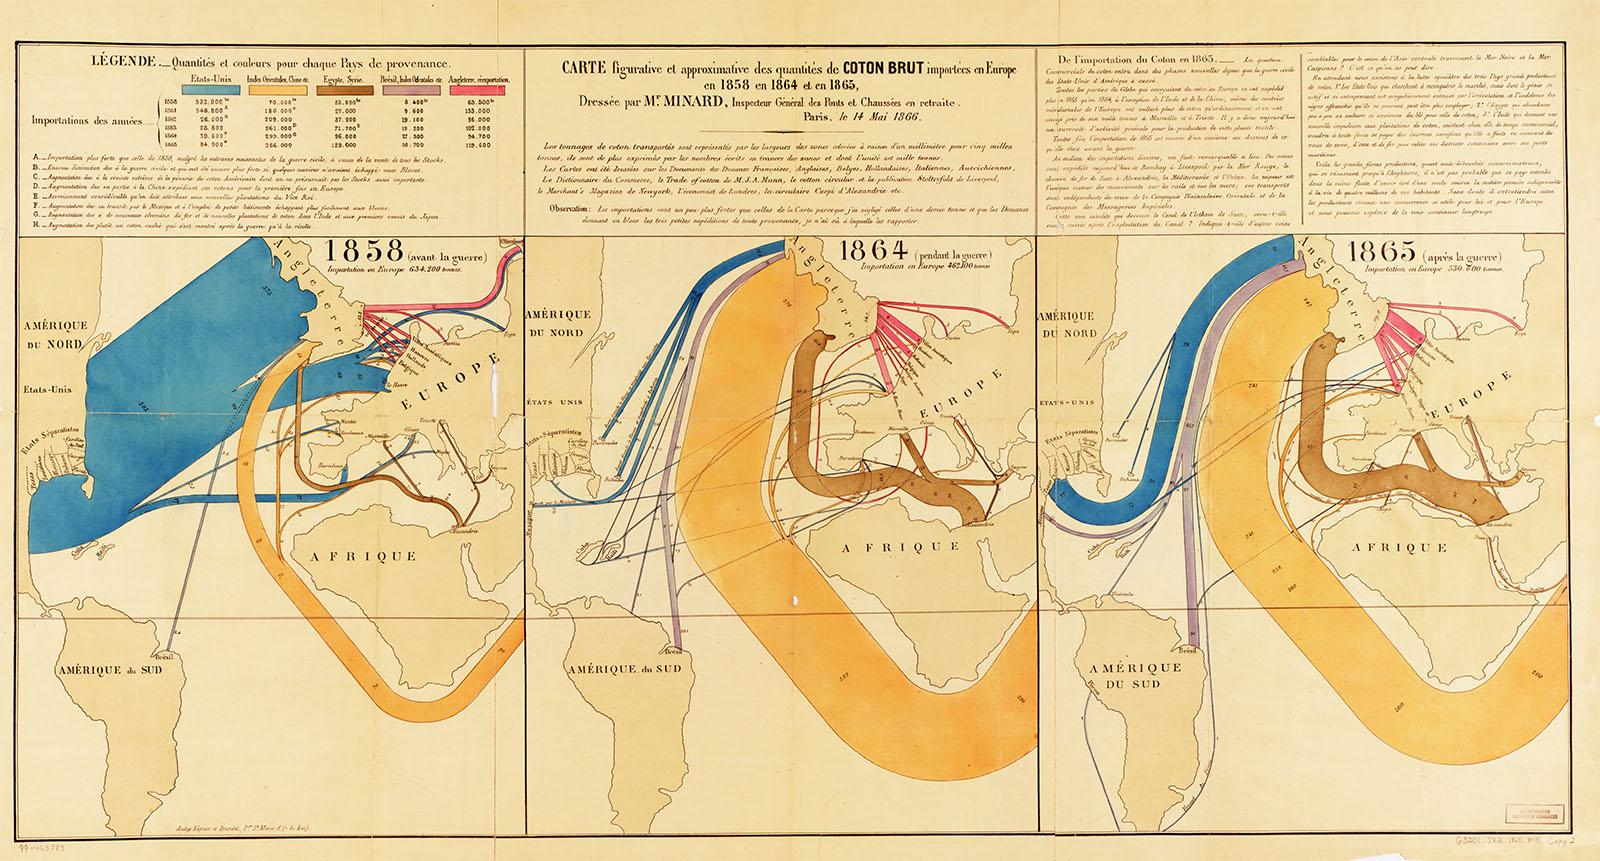 Map of European Cotton Imports during the American Civil War (Minard, 1866)